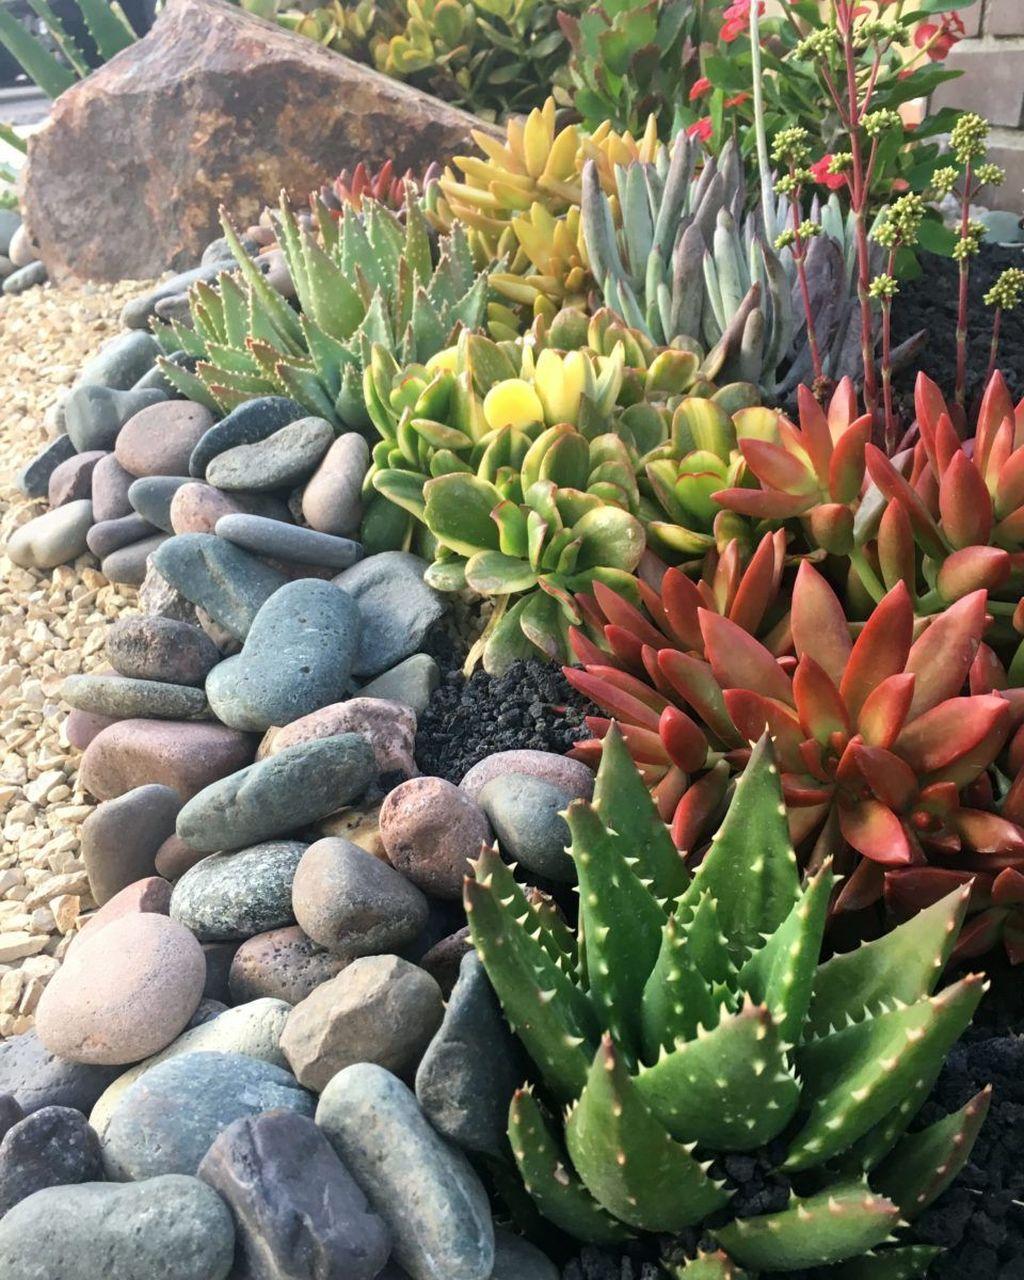 Incredible Cactus Garden Landscaping Ideas Best For Summer 18